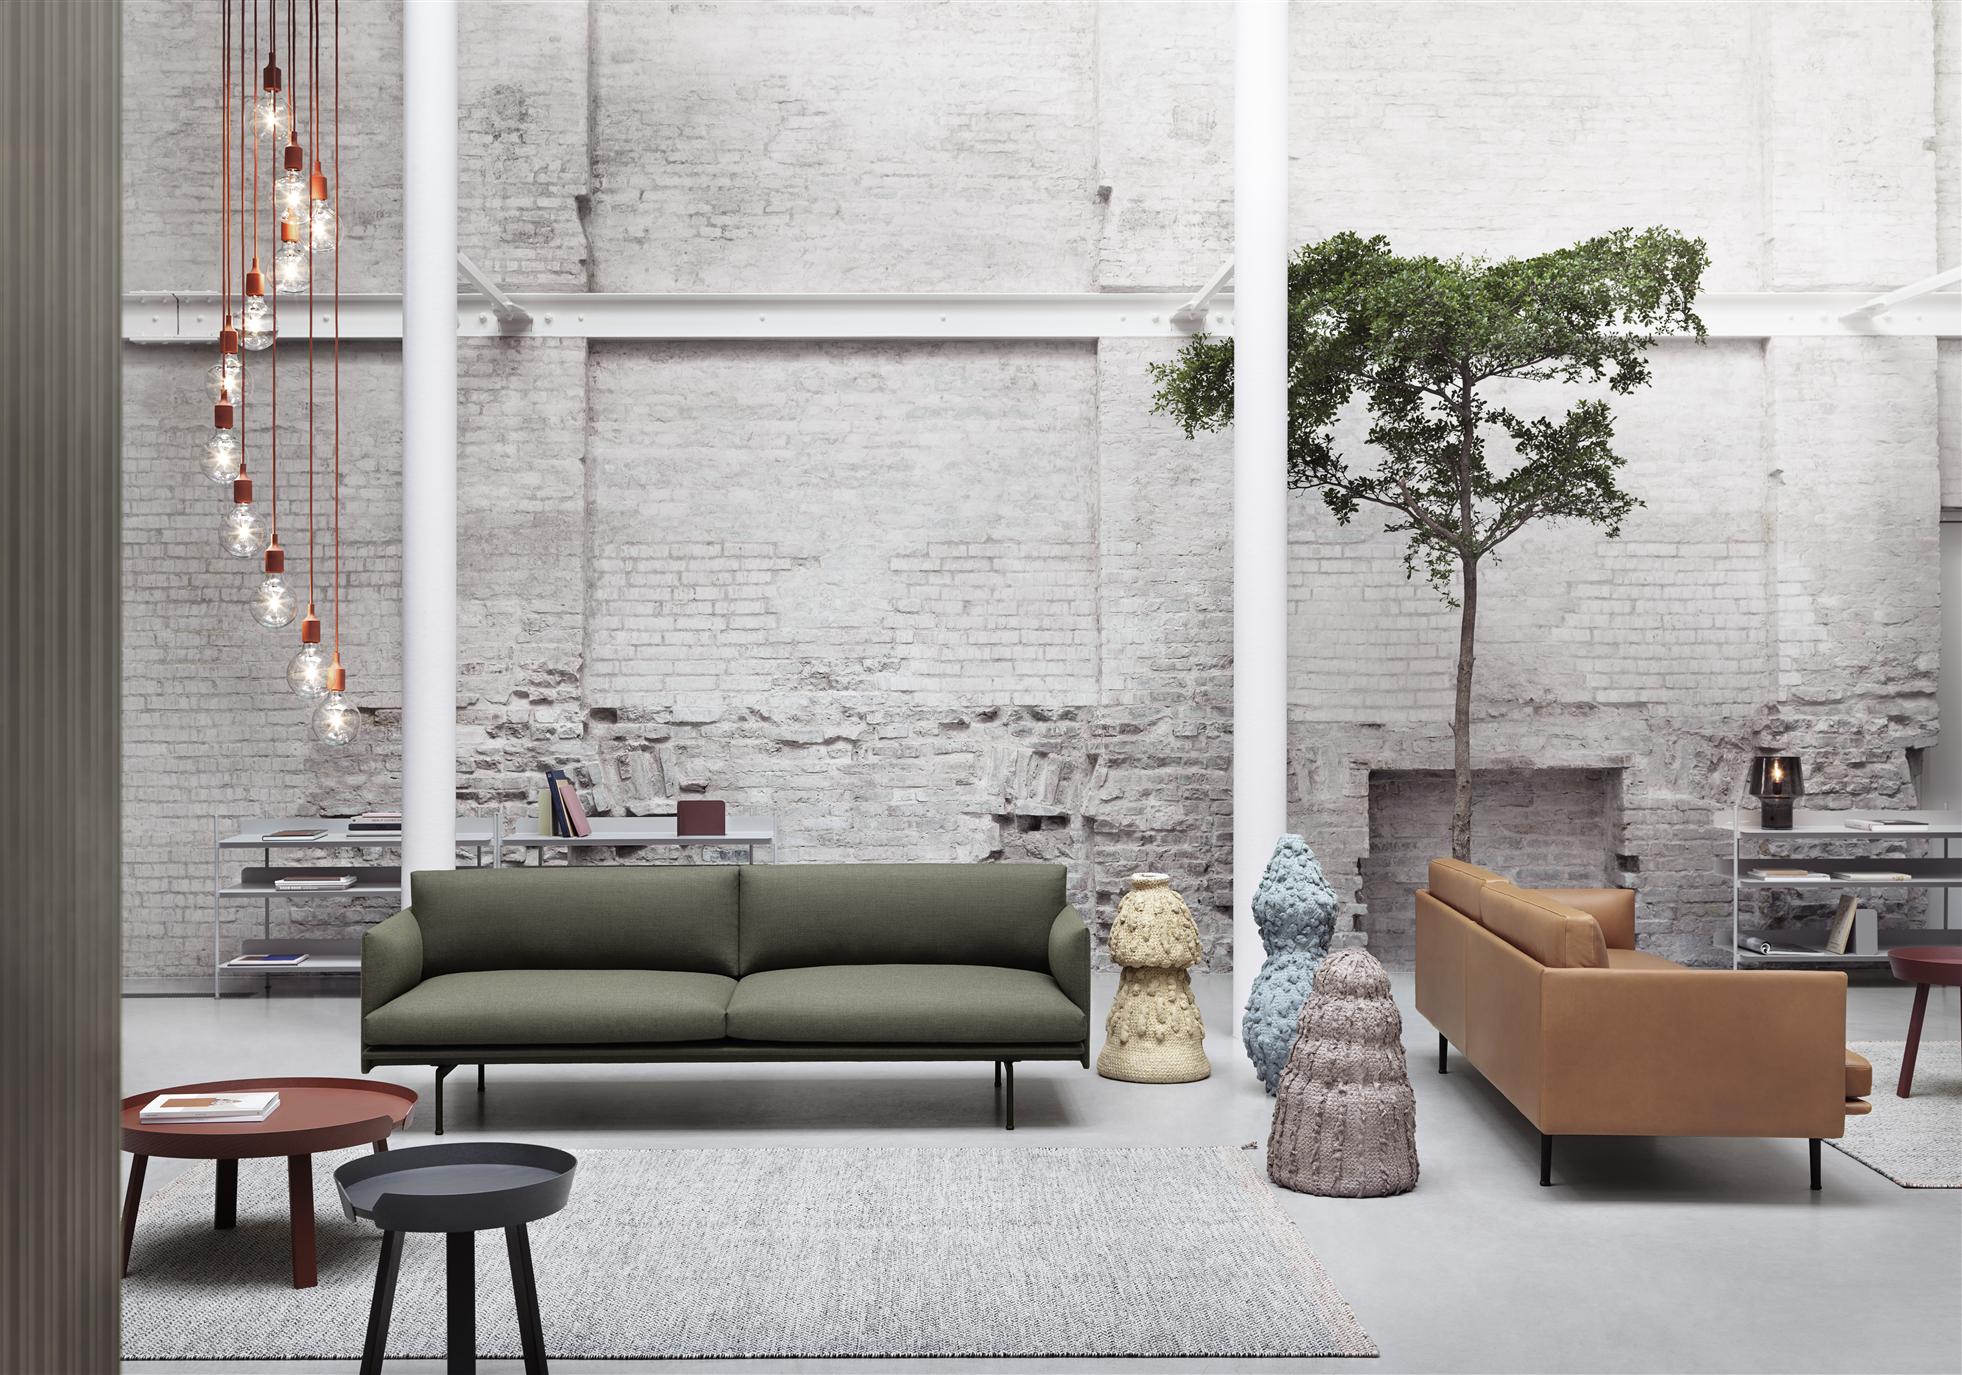 Outline sofa - An Elegant Design